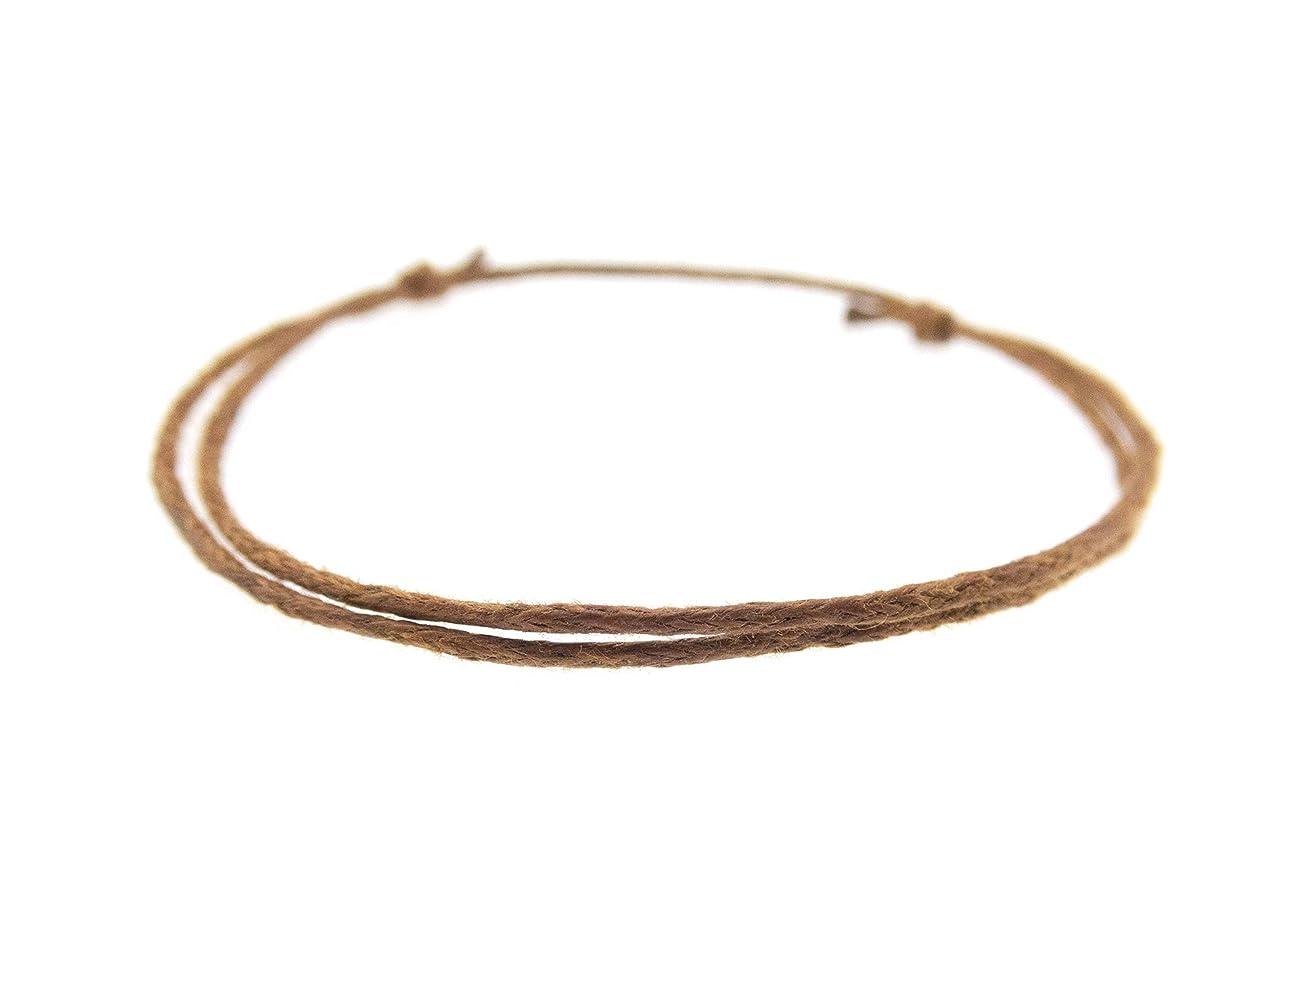 Surfer Bracelet, Nautical Minimalist Jewelry of Tiny Rope